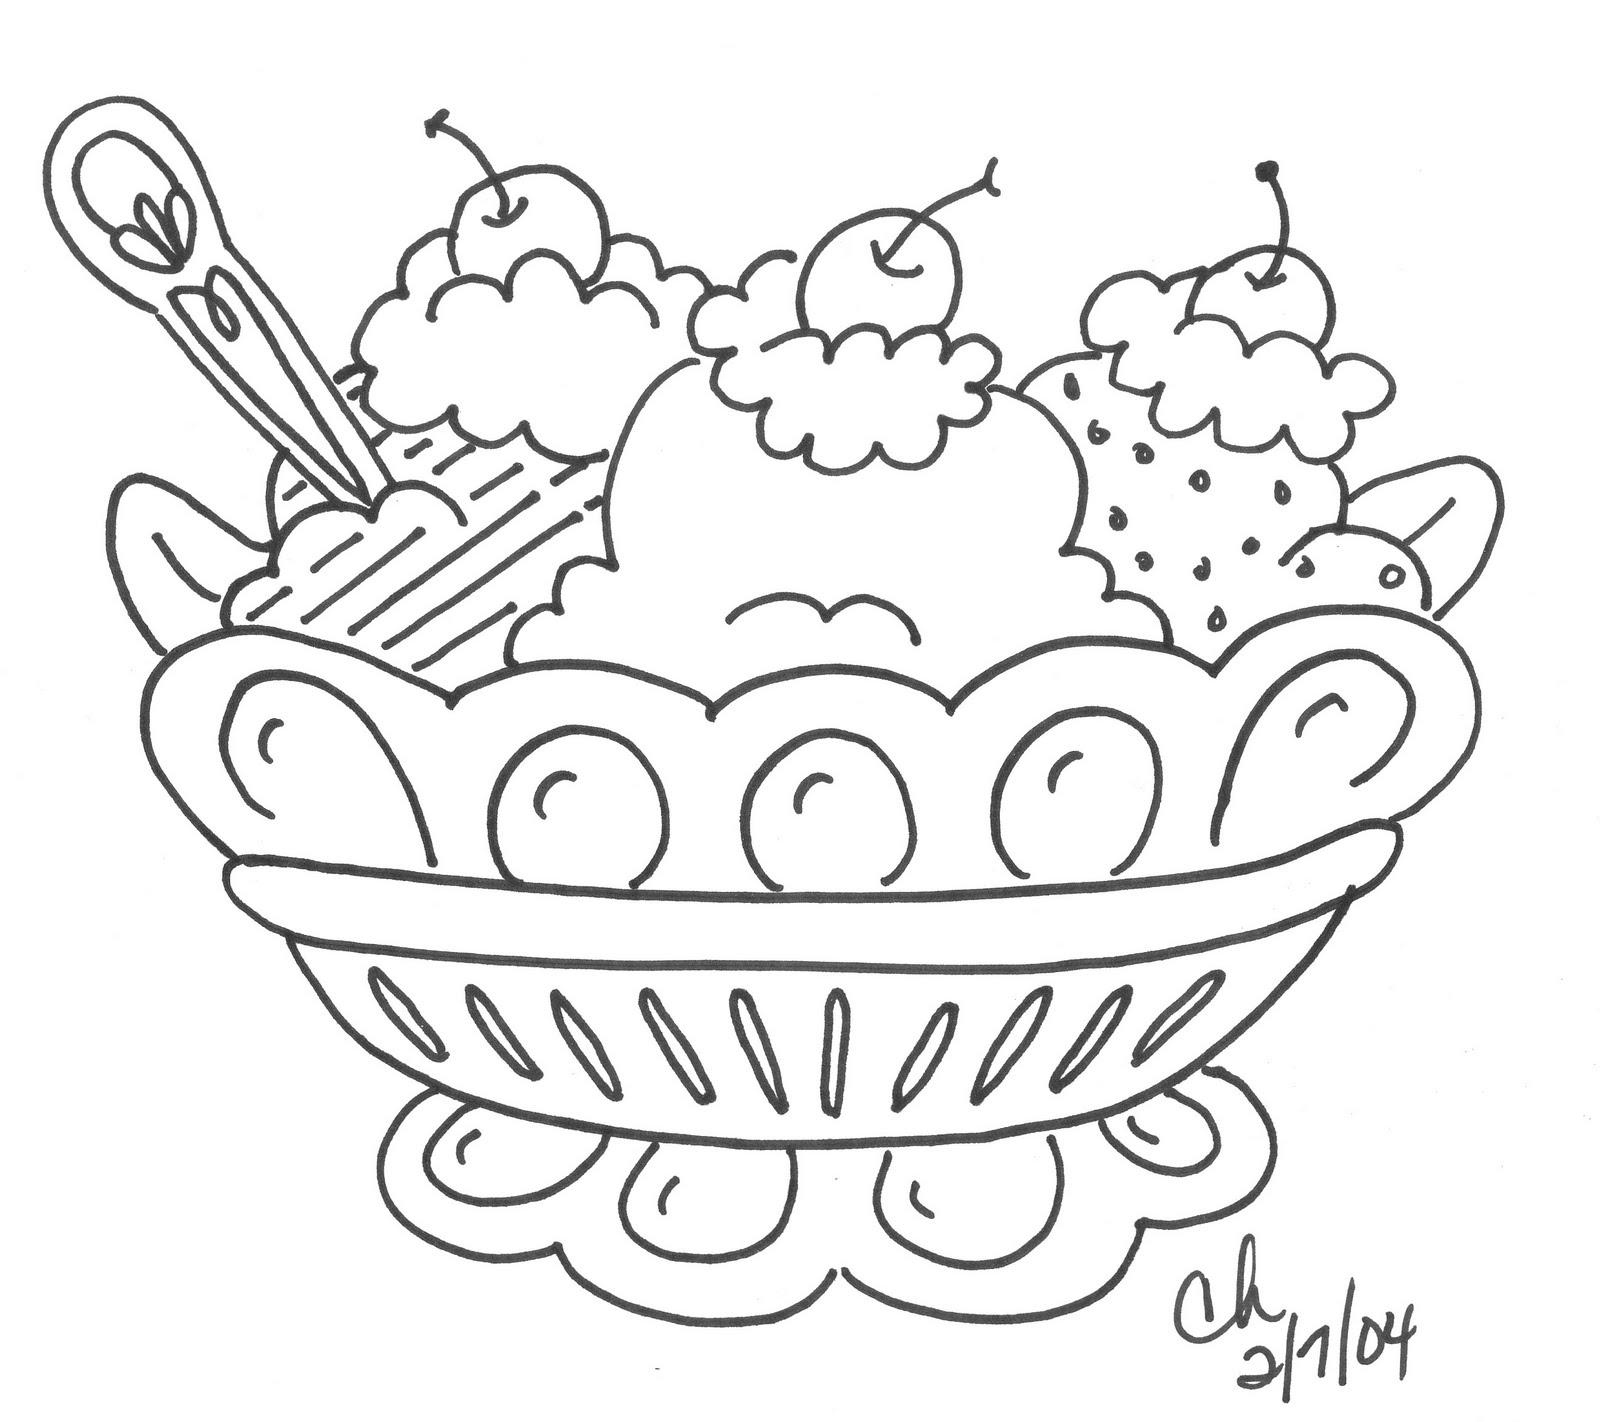 1600x1422 Stitch, Stitch, Stitch Free Redwork Dessert Stitcheries